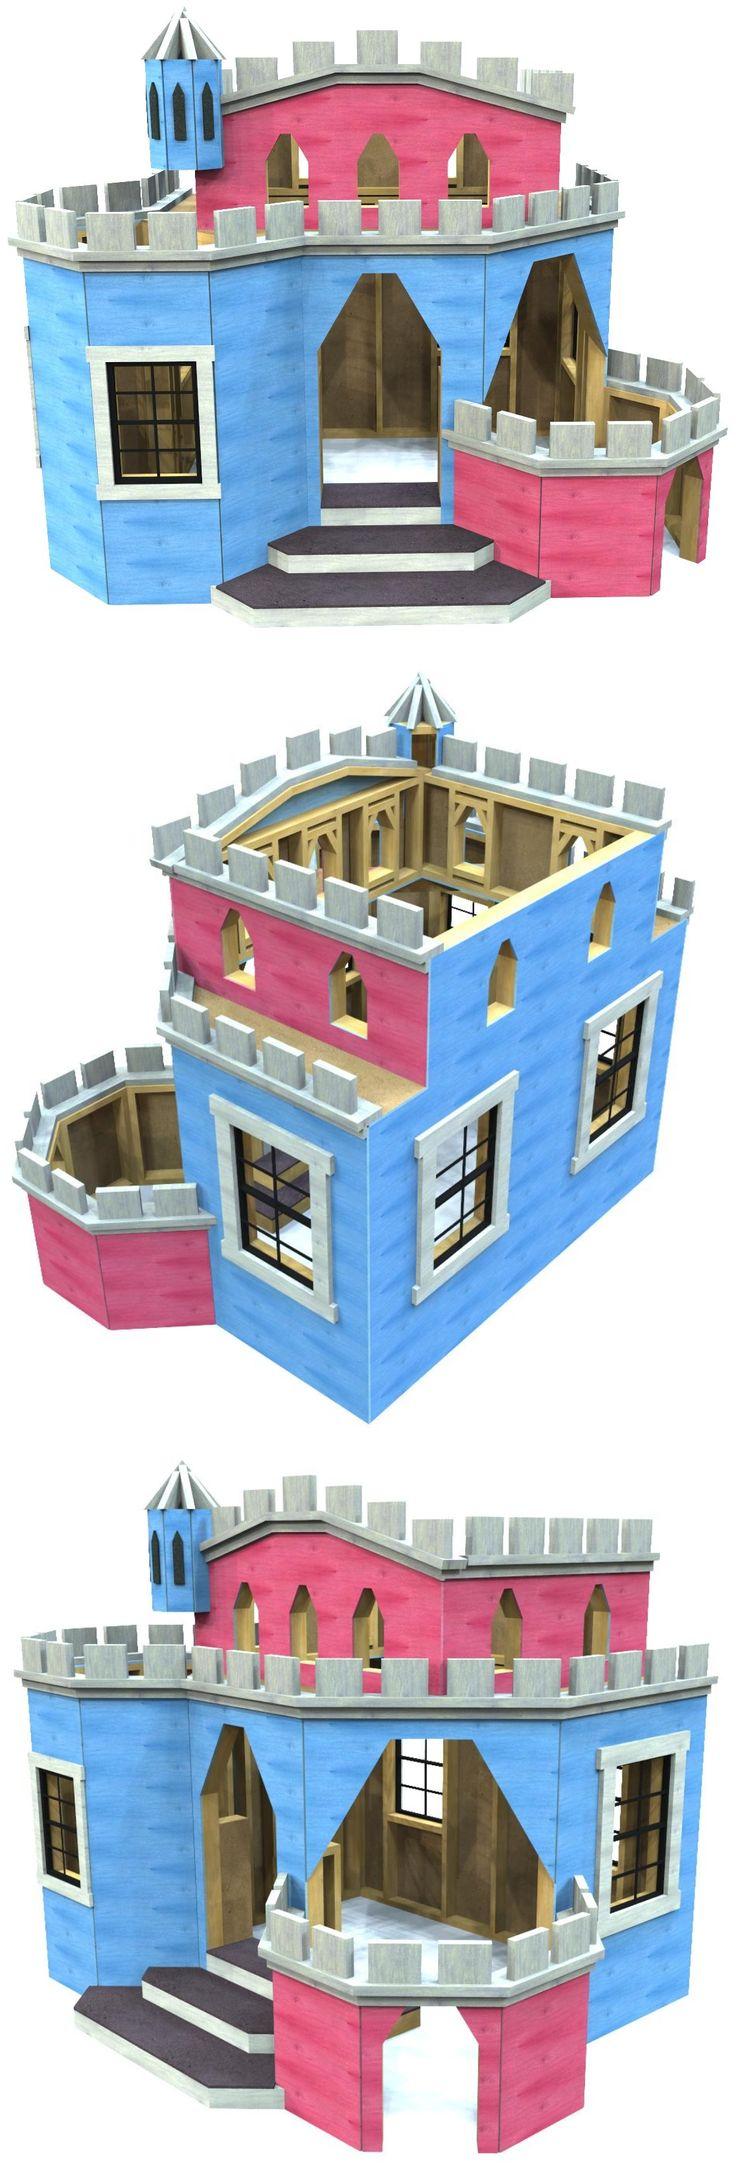 best 25+ castle playhouse ideas on pinterest | playground ideas